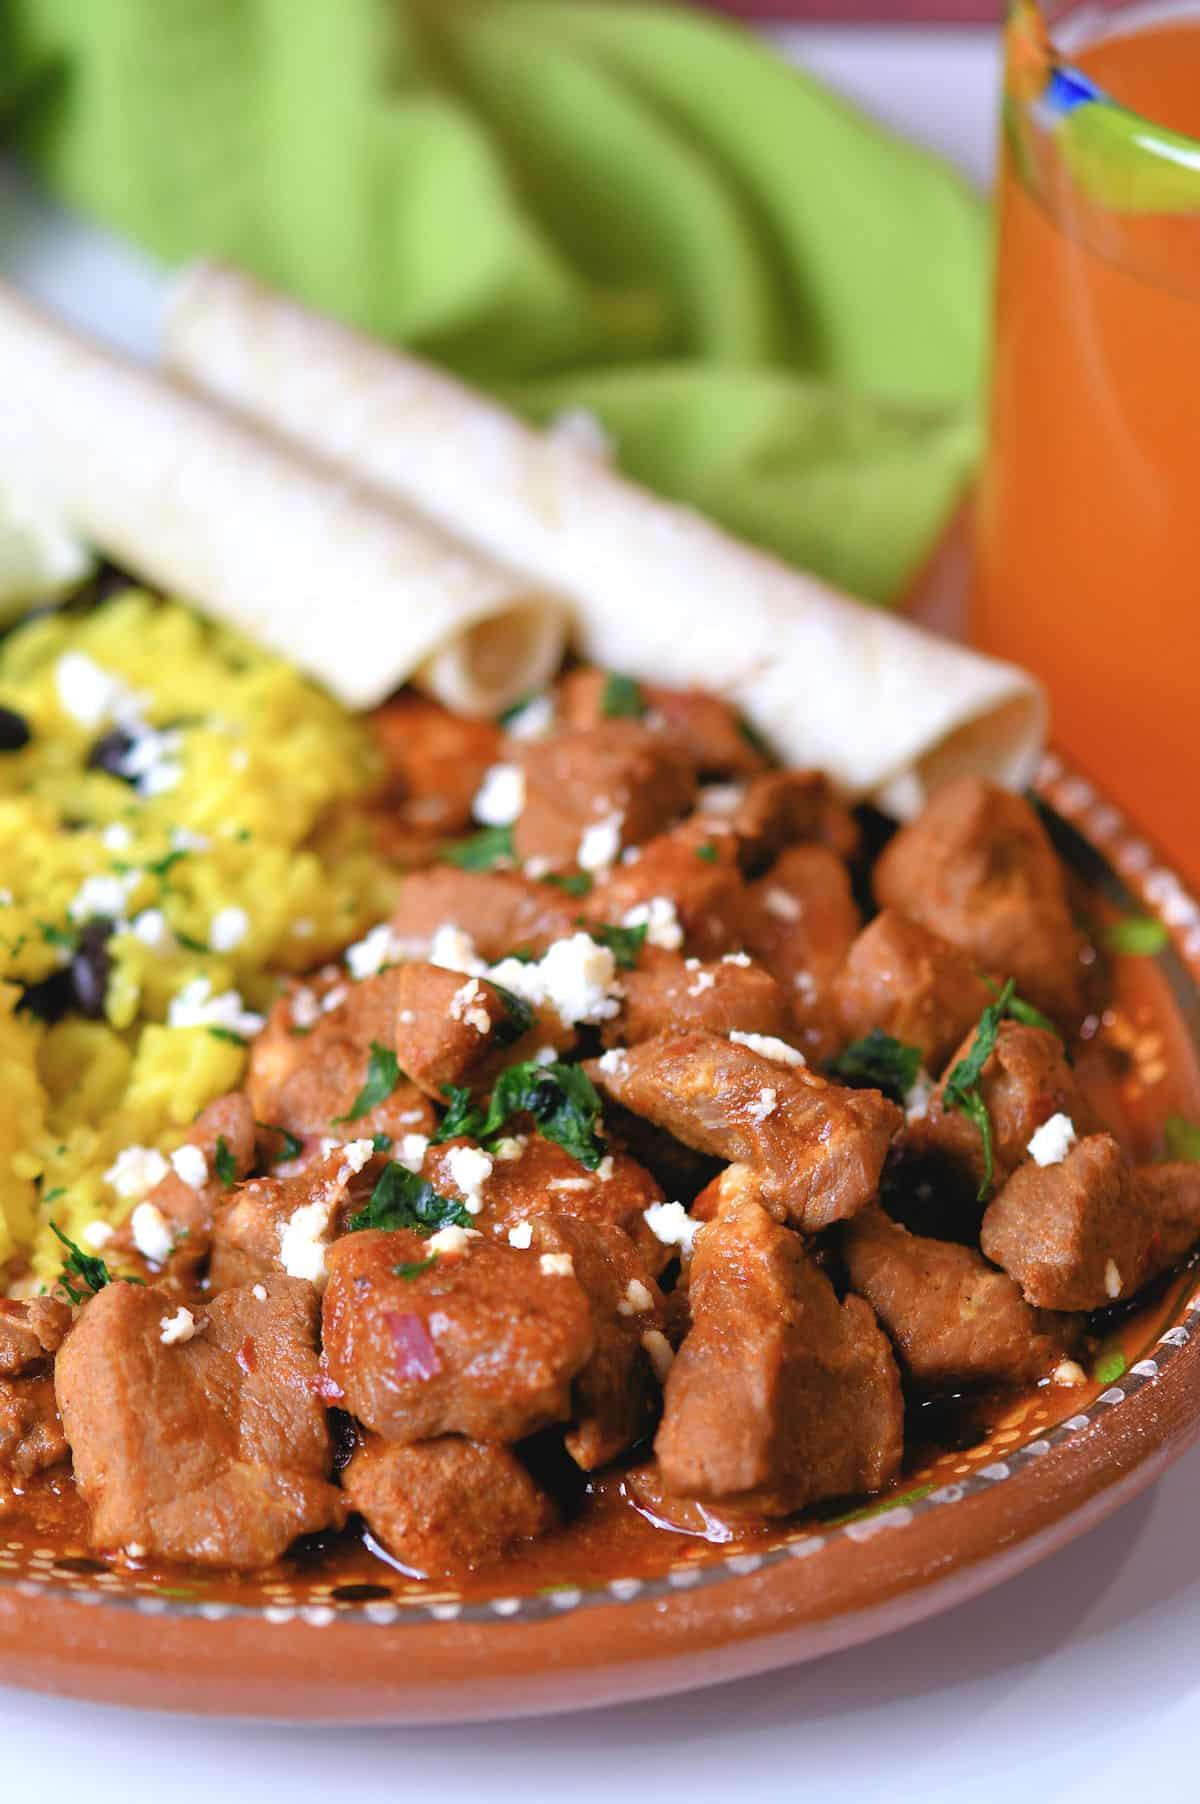 24bite: Pork Chile Colorado Asado recipe by Christian Guzman